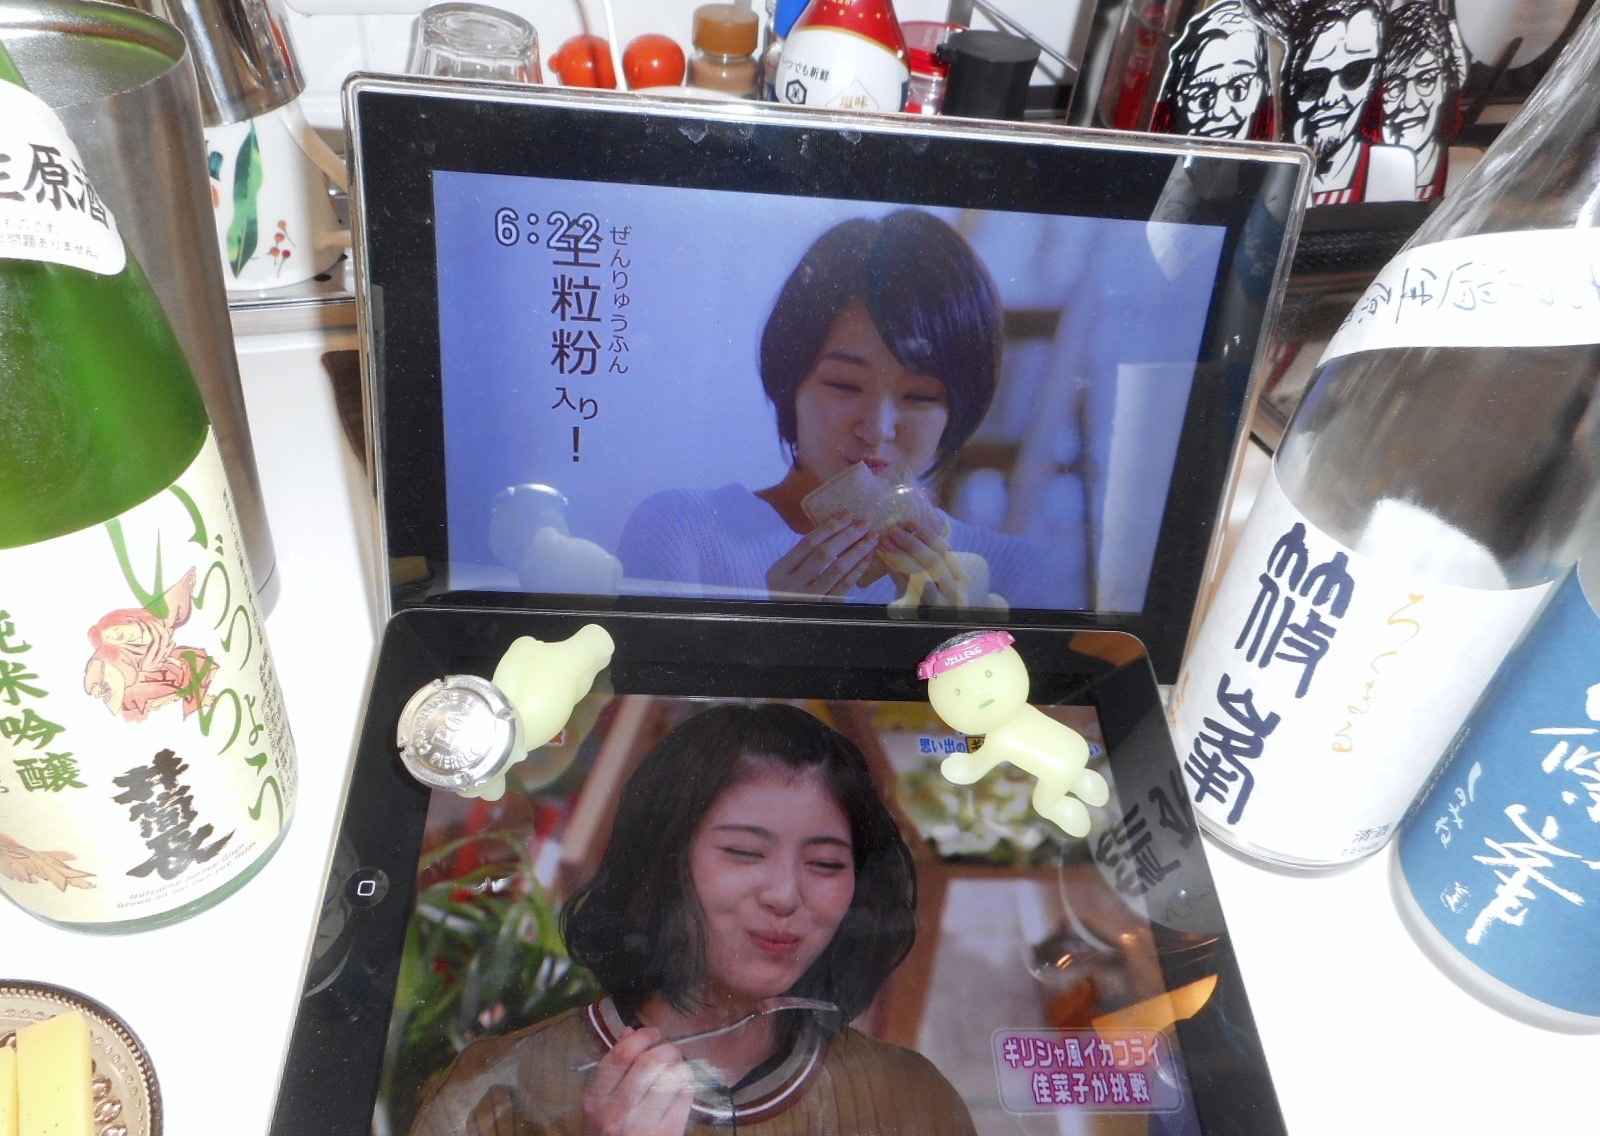 izutsuchou_jikagumi29by2_7.jpg